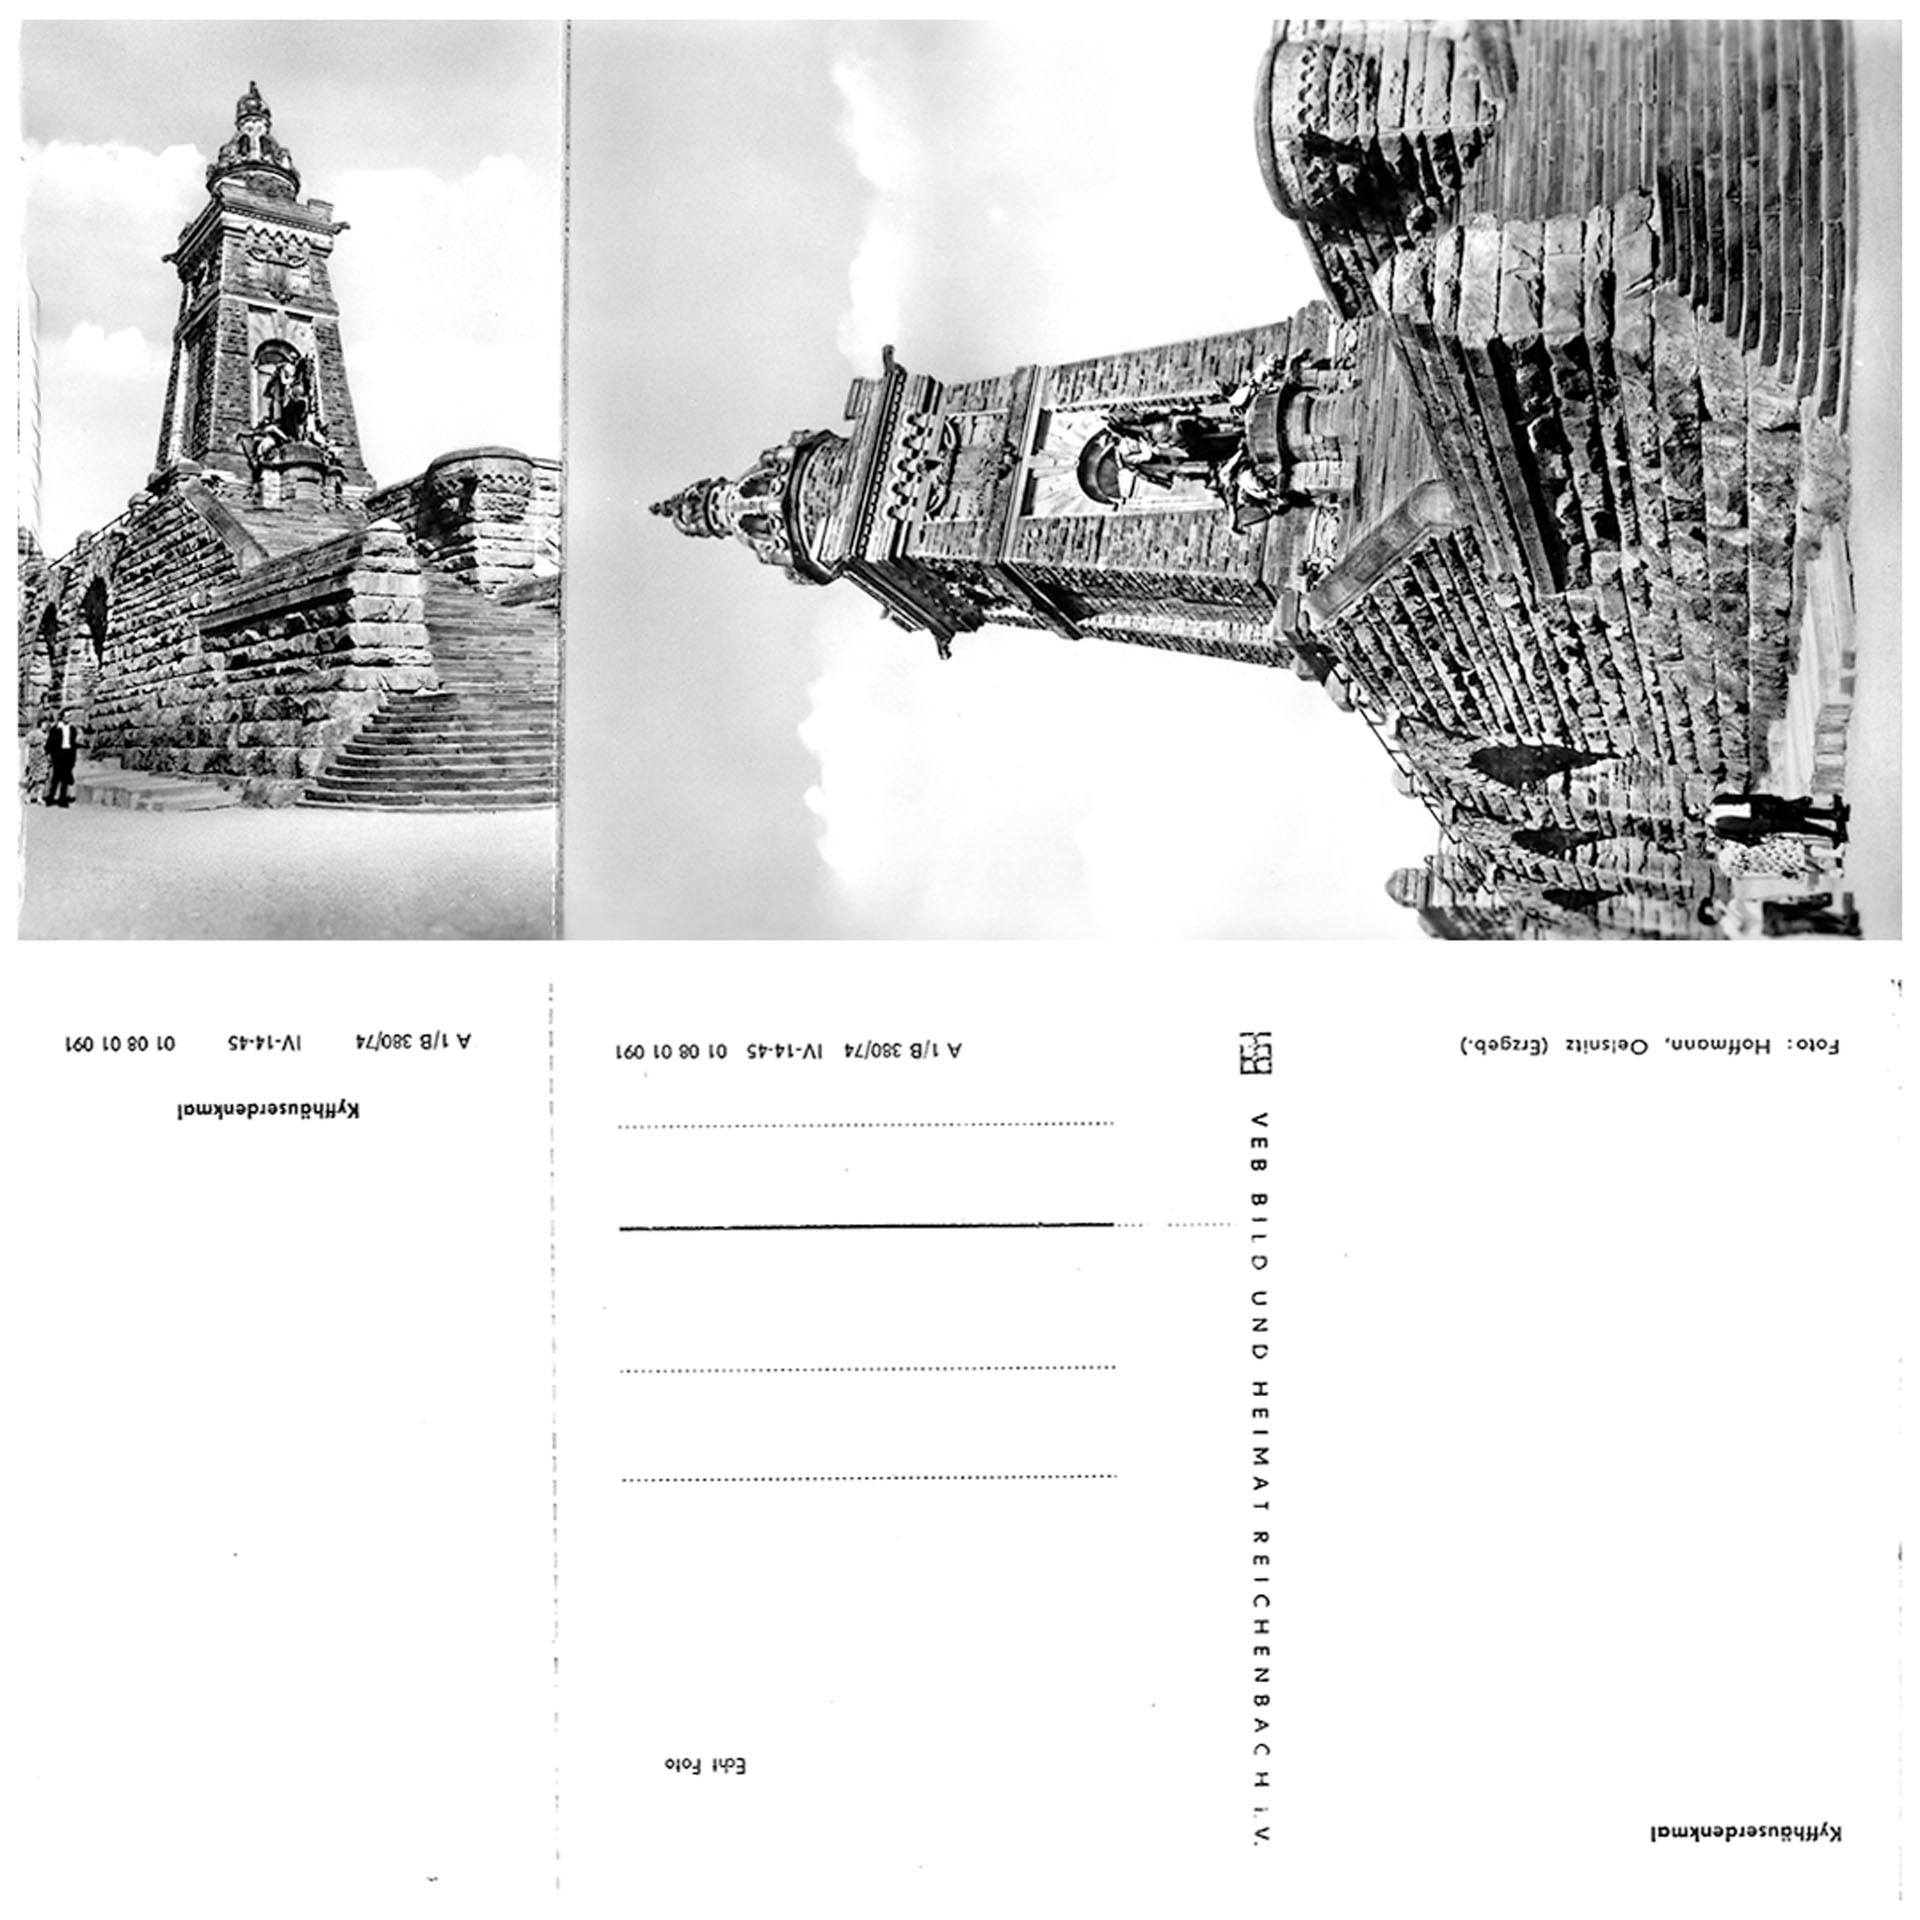 Kyffhäuser-Kyffhäuserdenkmal